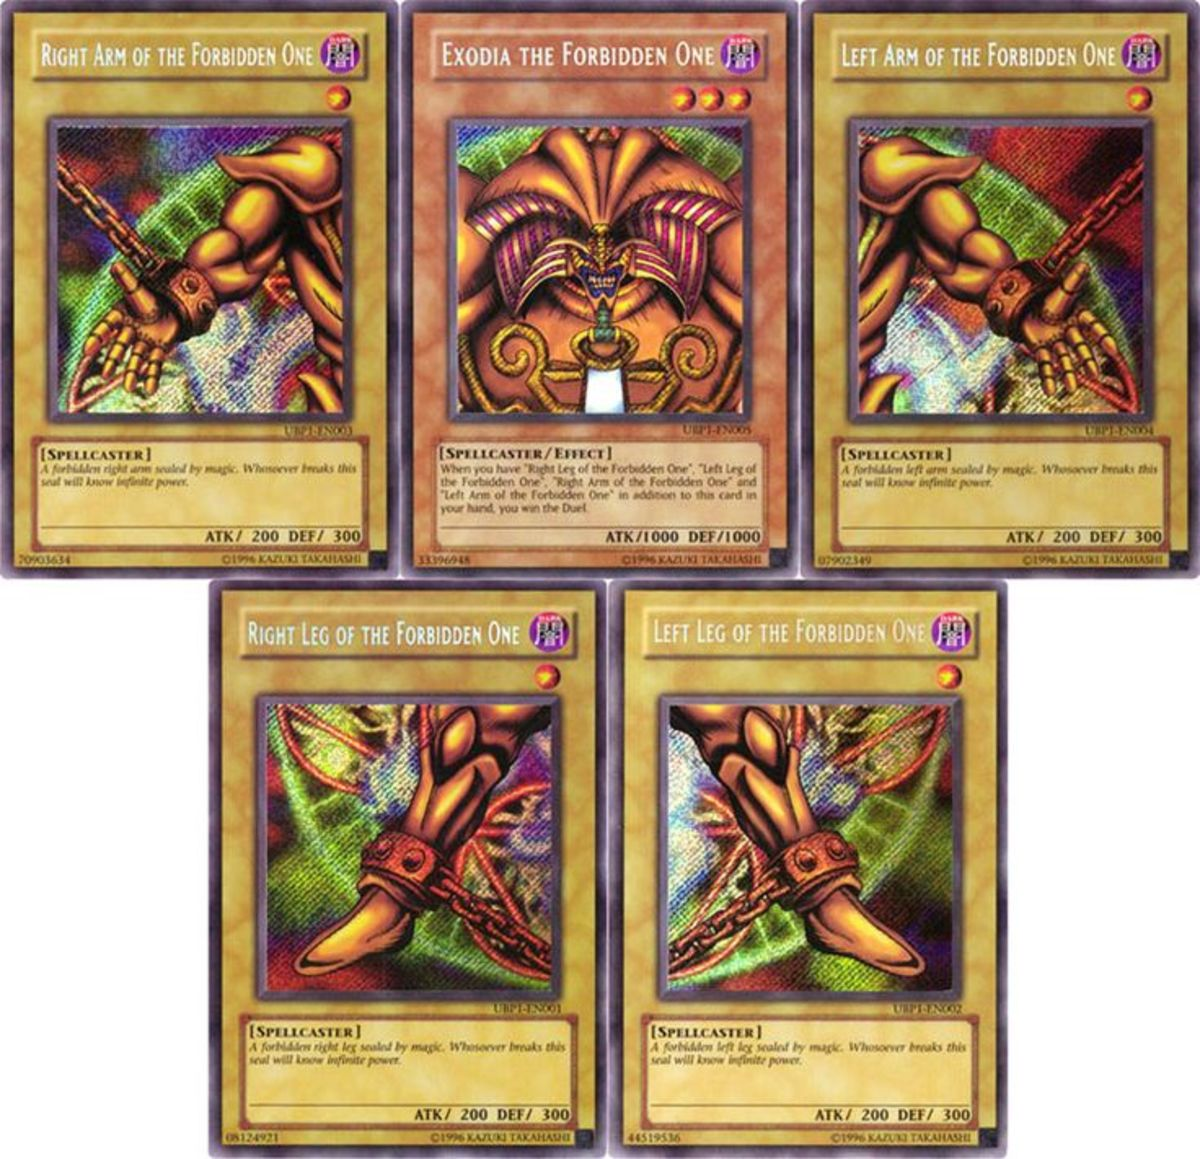 The Exodia Cards